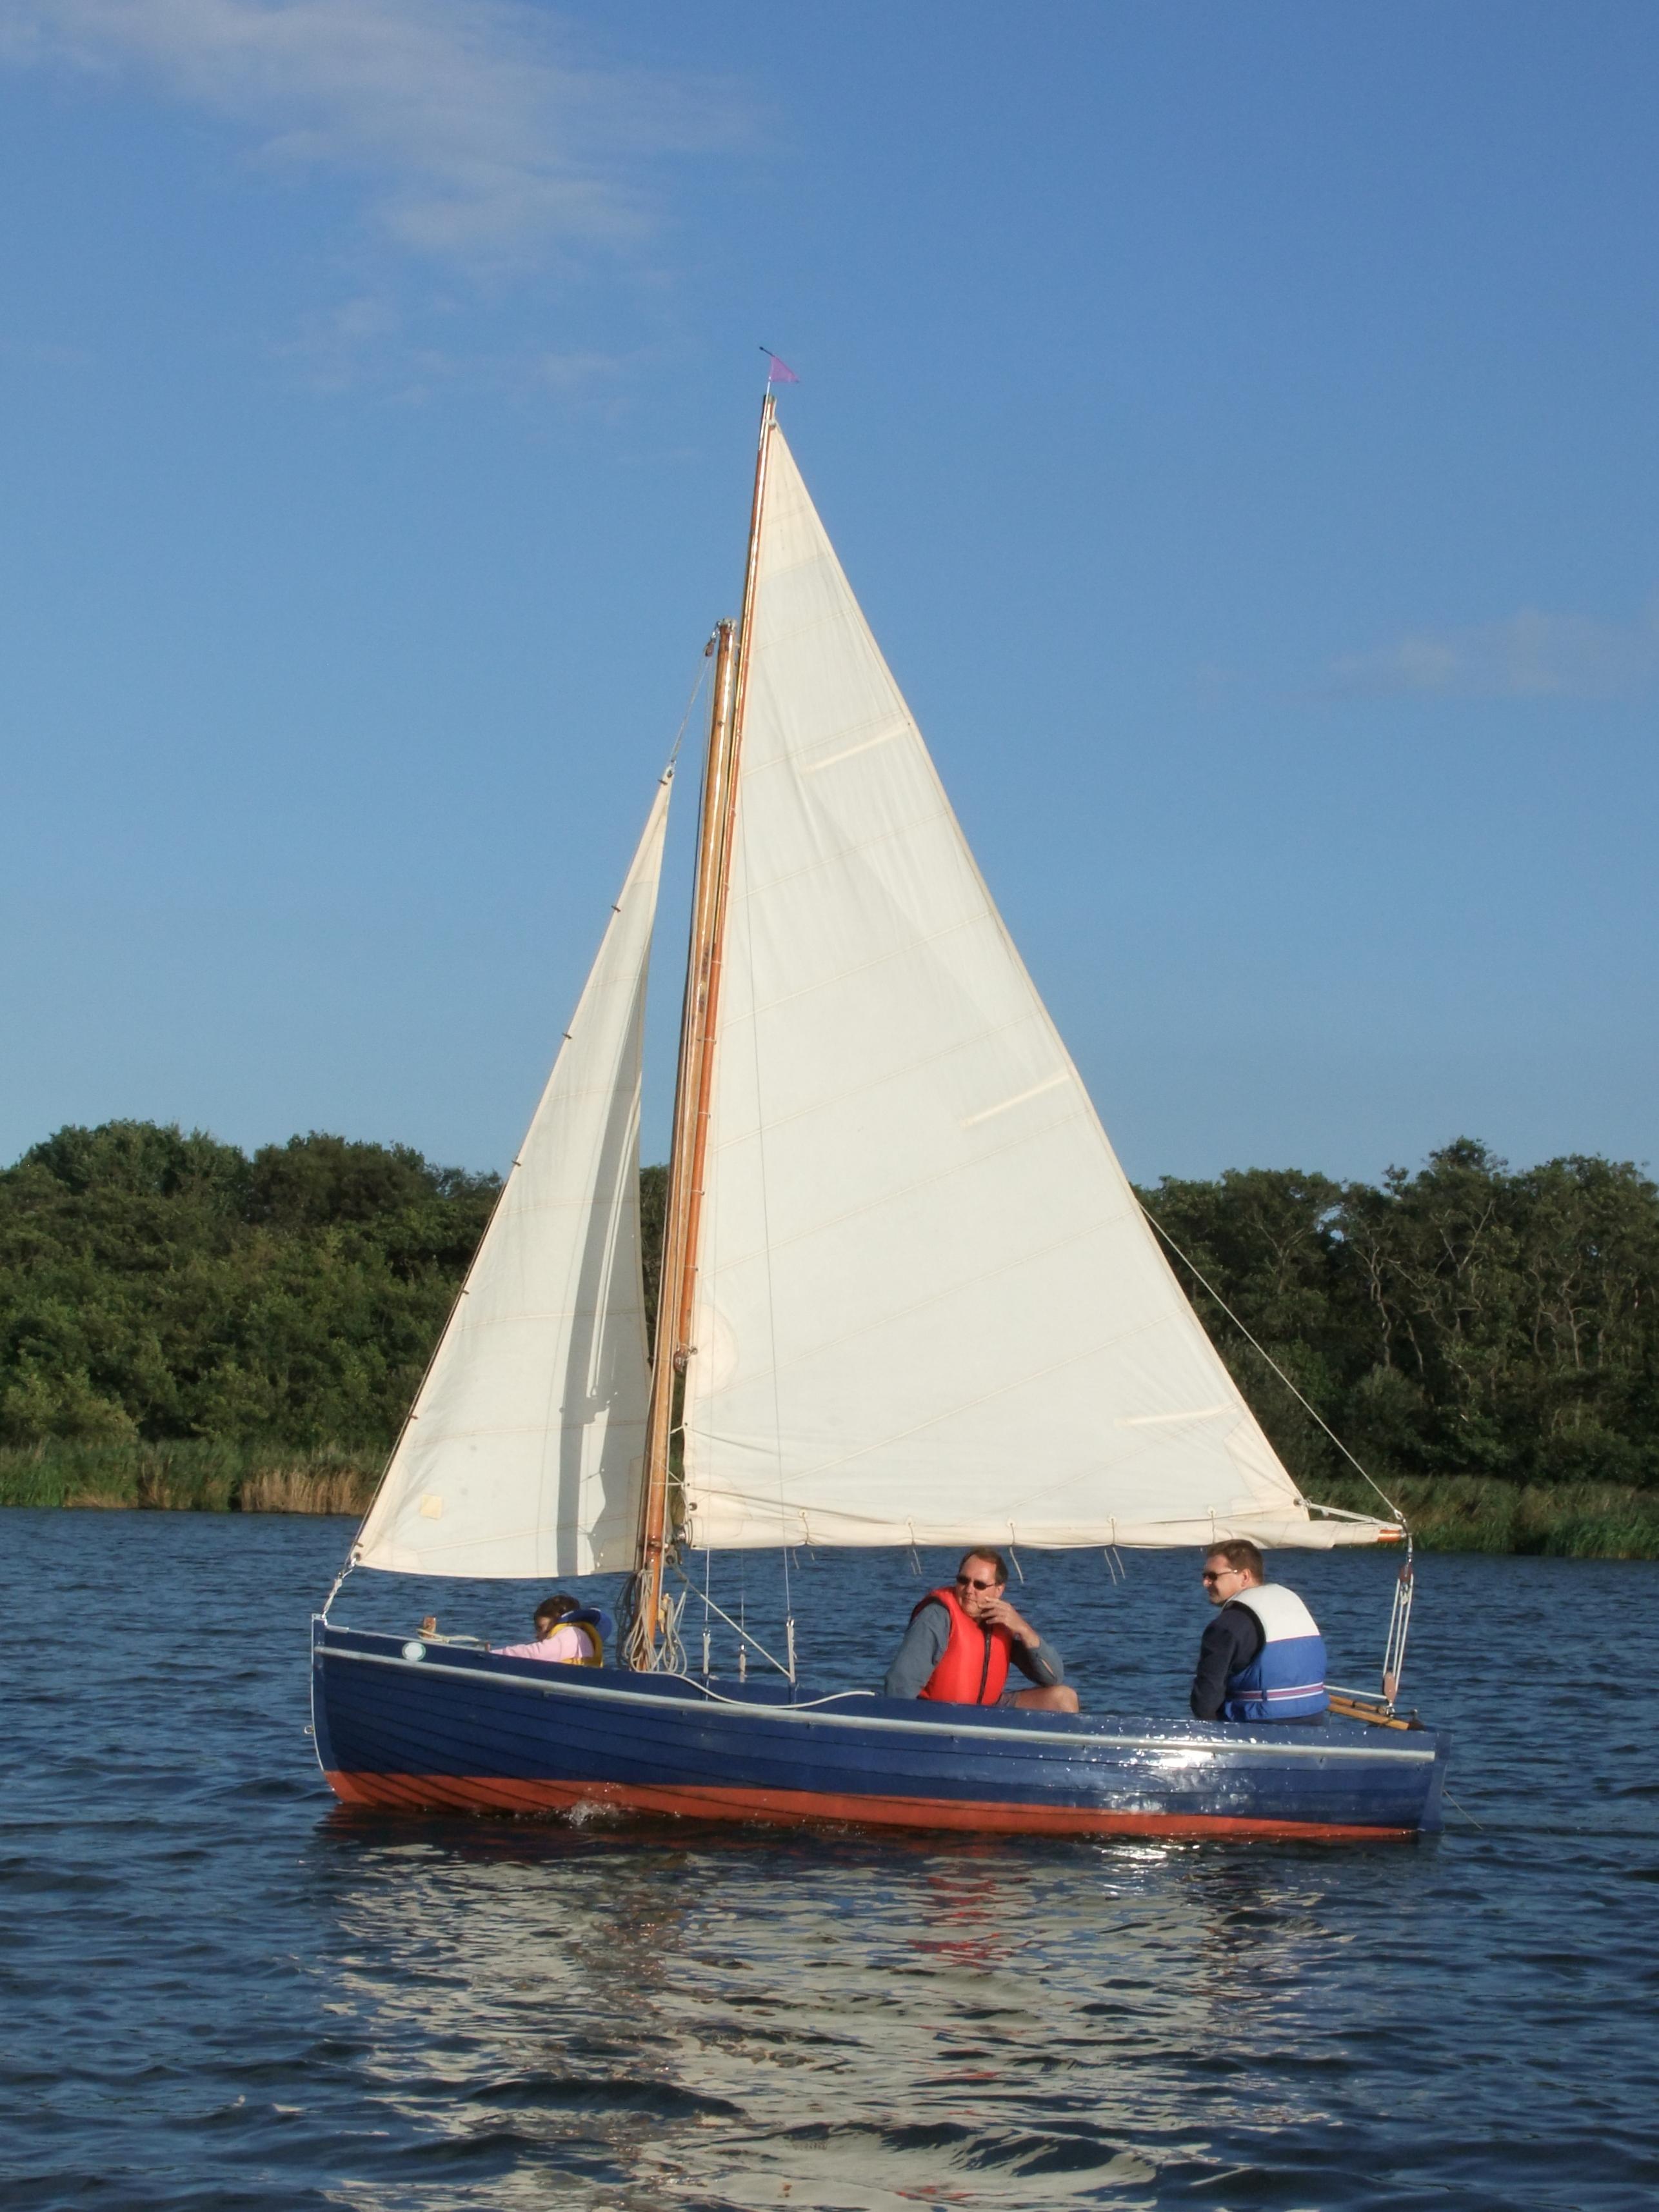 On-Barton-Broad-11-RNSA-dinghy-sails-by.jpg (2572×3429) | sailing ...